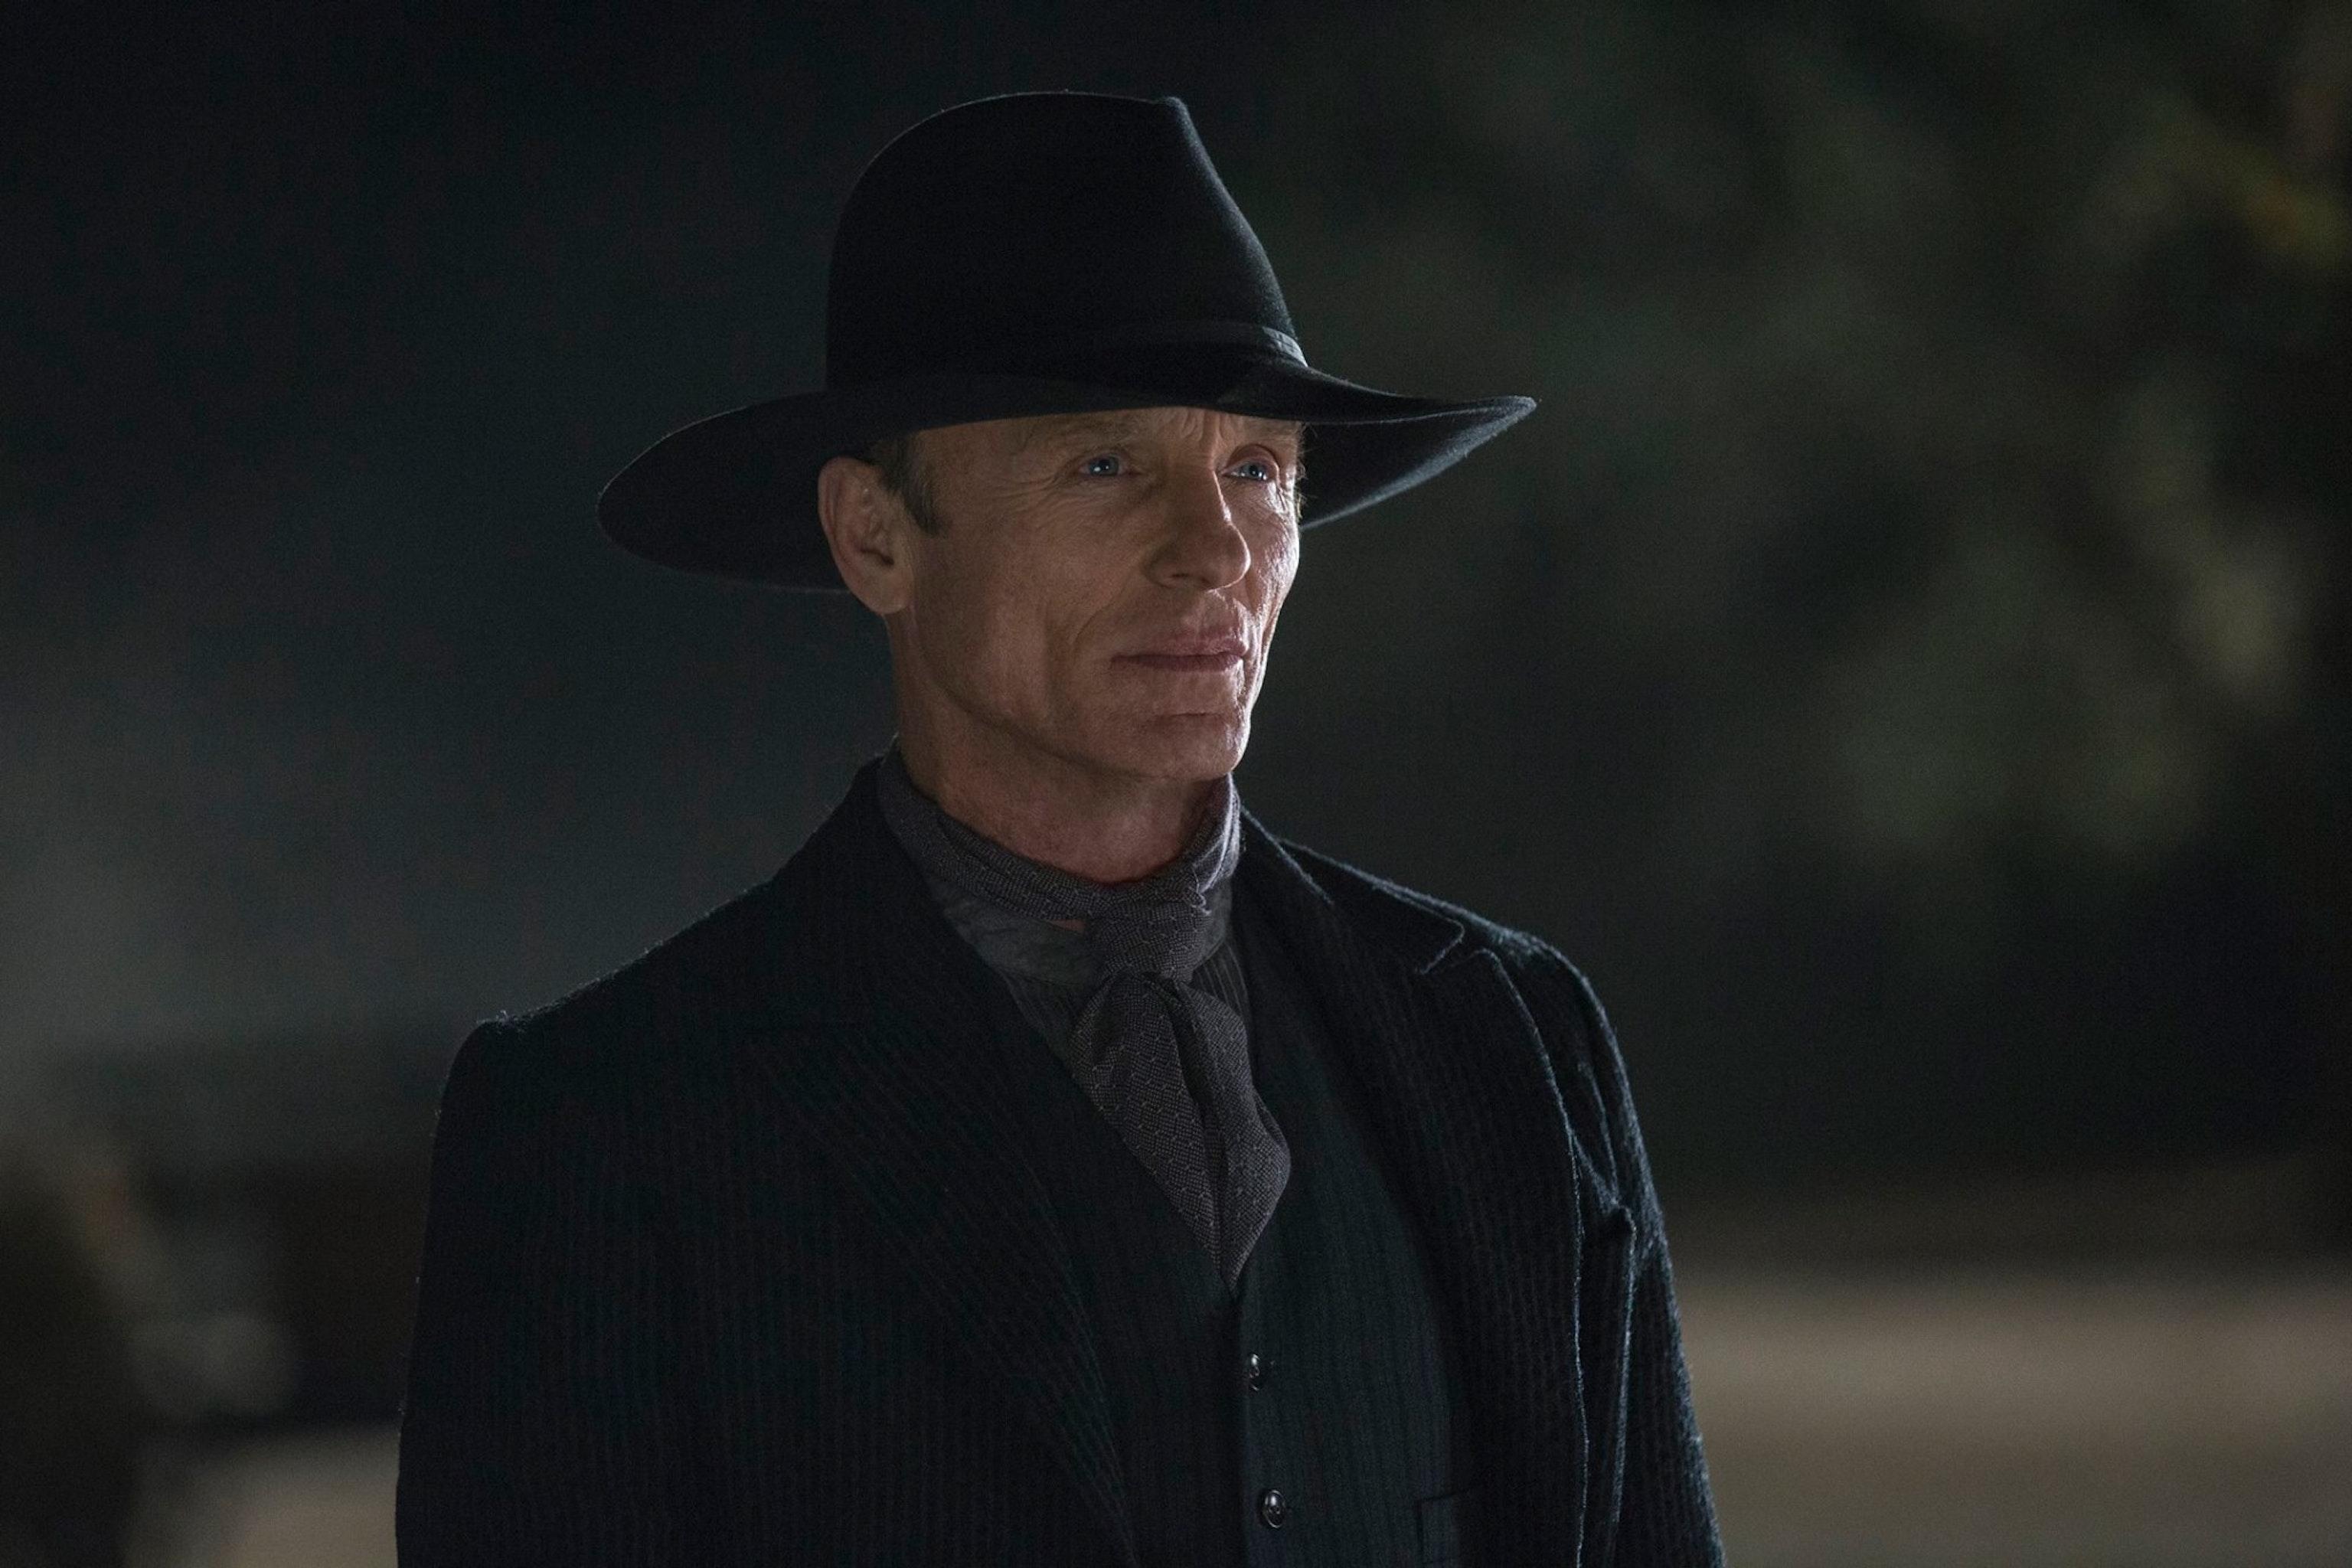 Ed Harris as The Man in Black